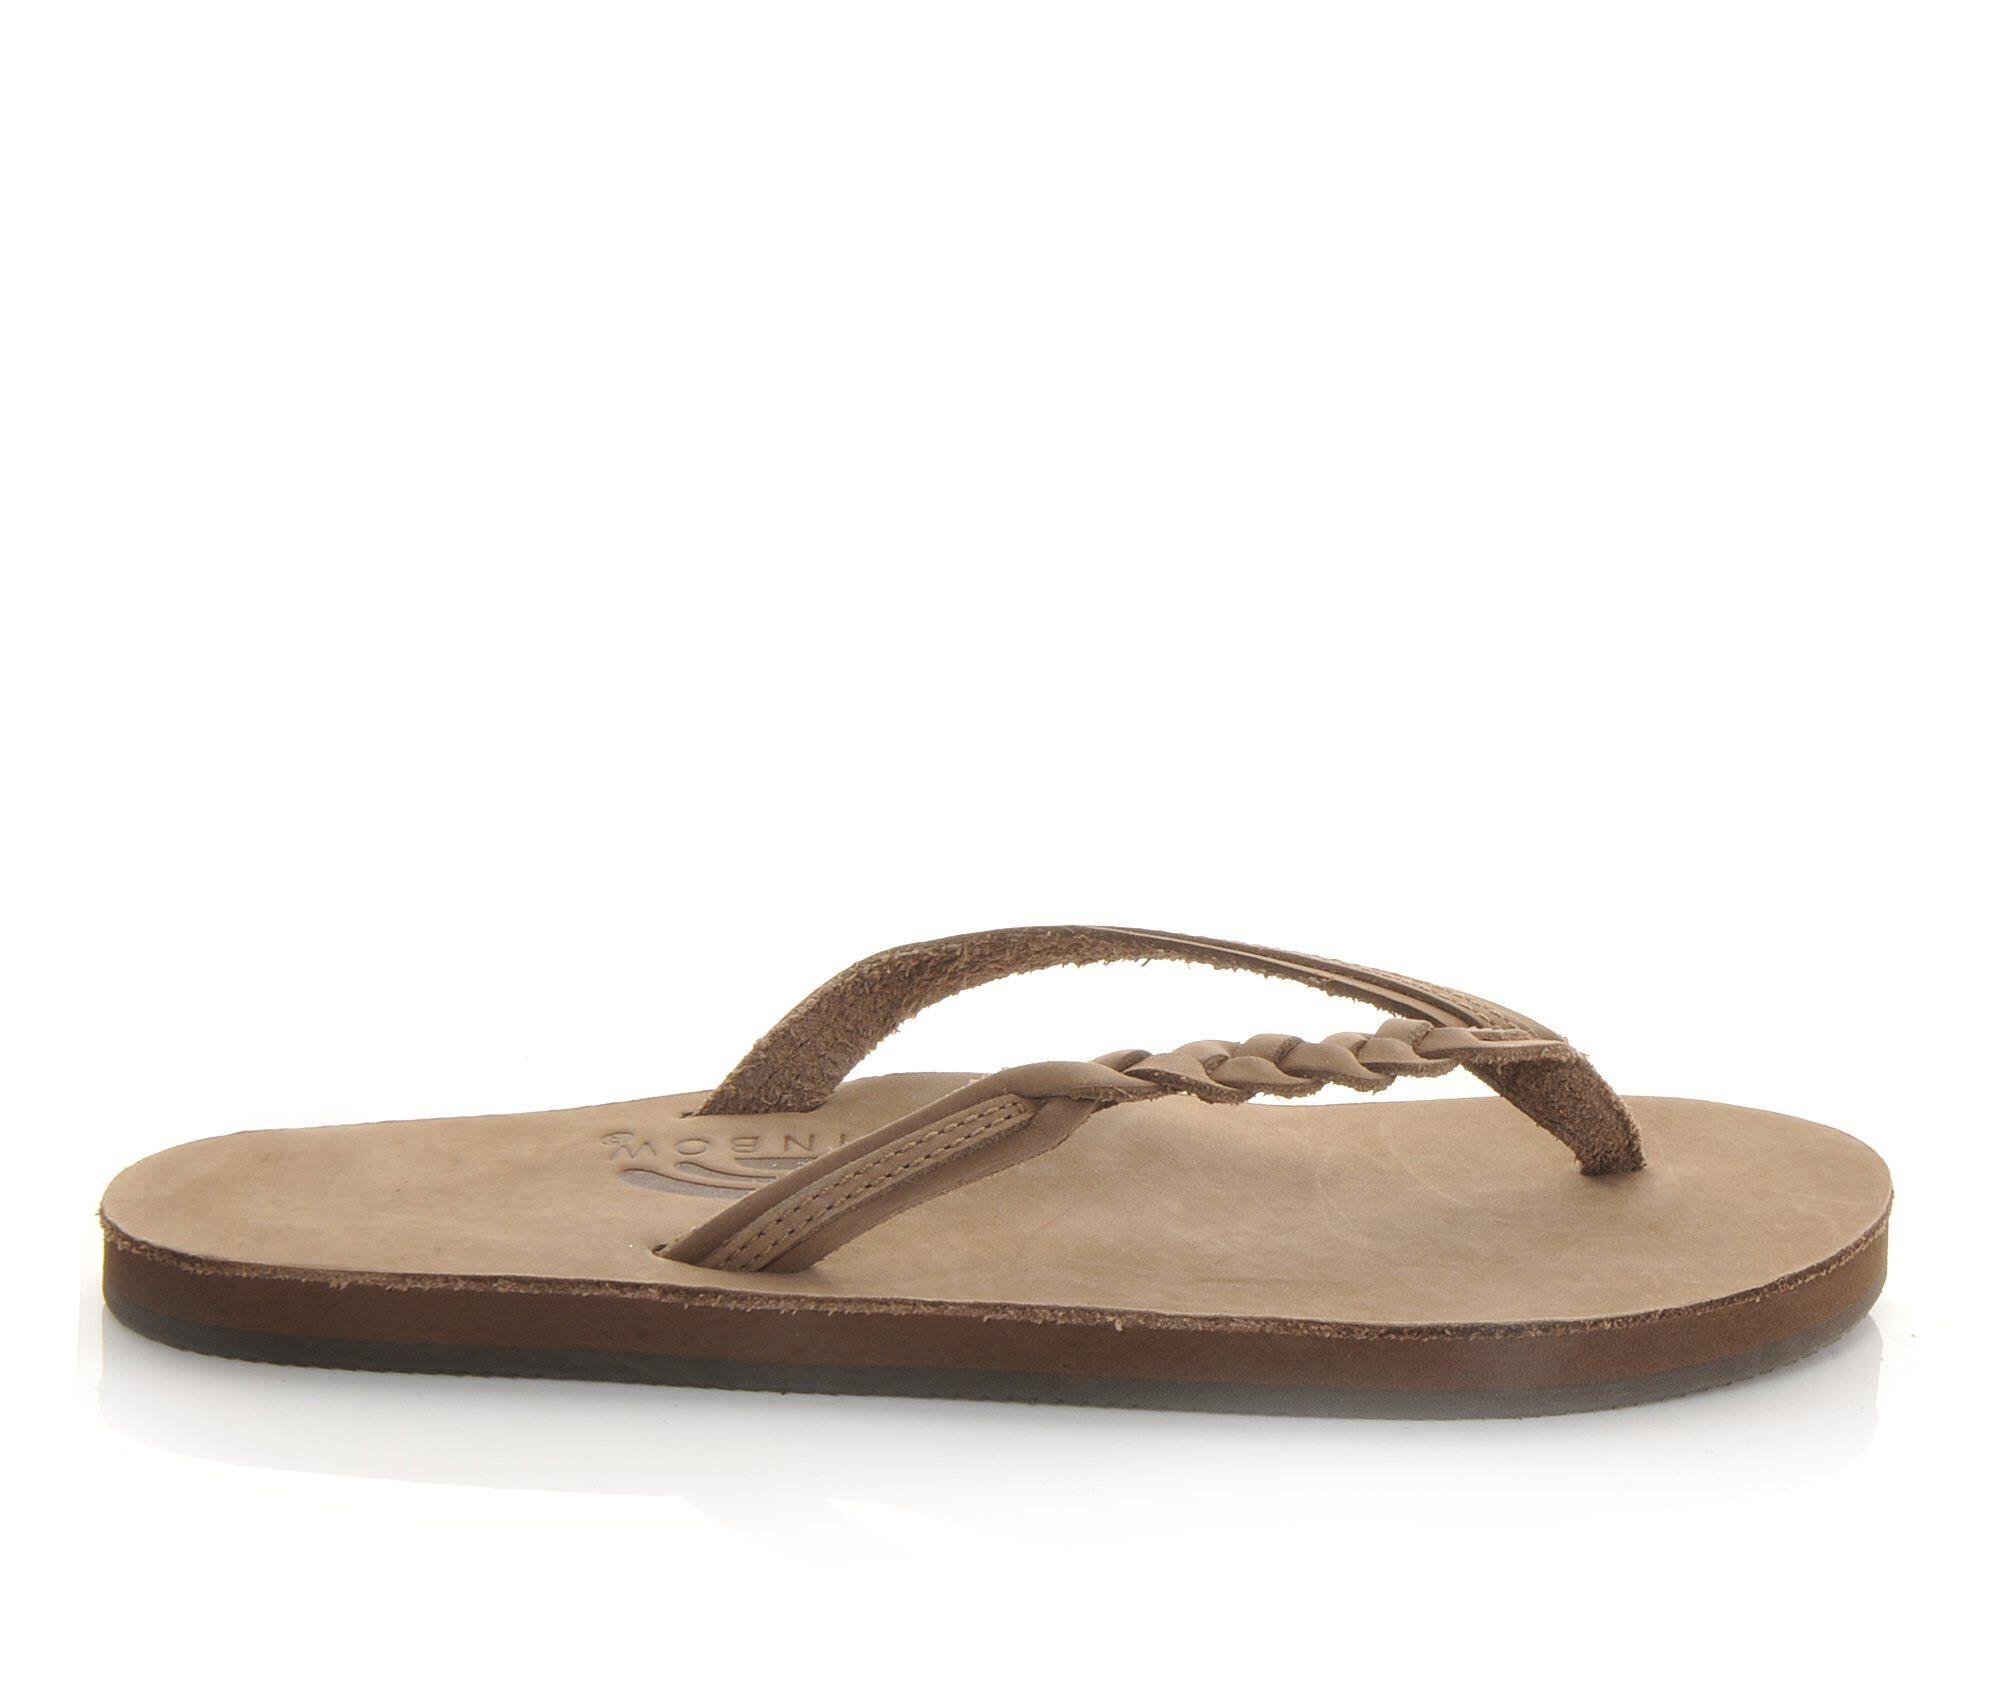 buy special Women's Rainbow Sandals Flirty Braidy -301ALTSB Flip-Flops Sierra Brown